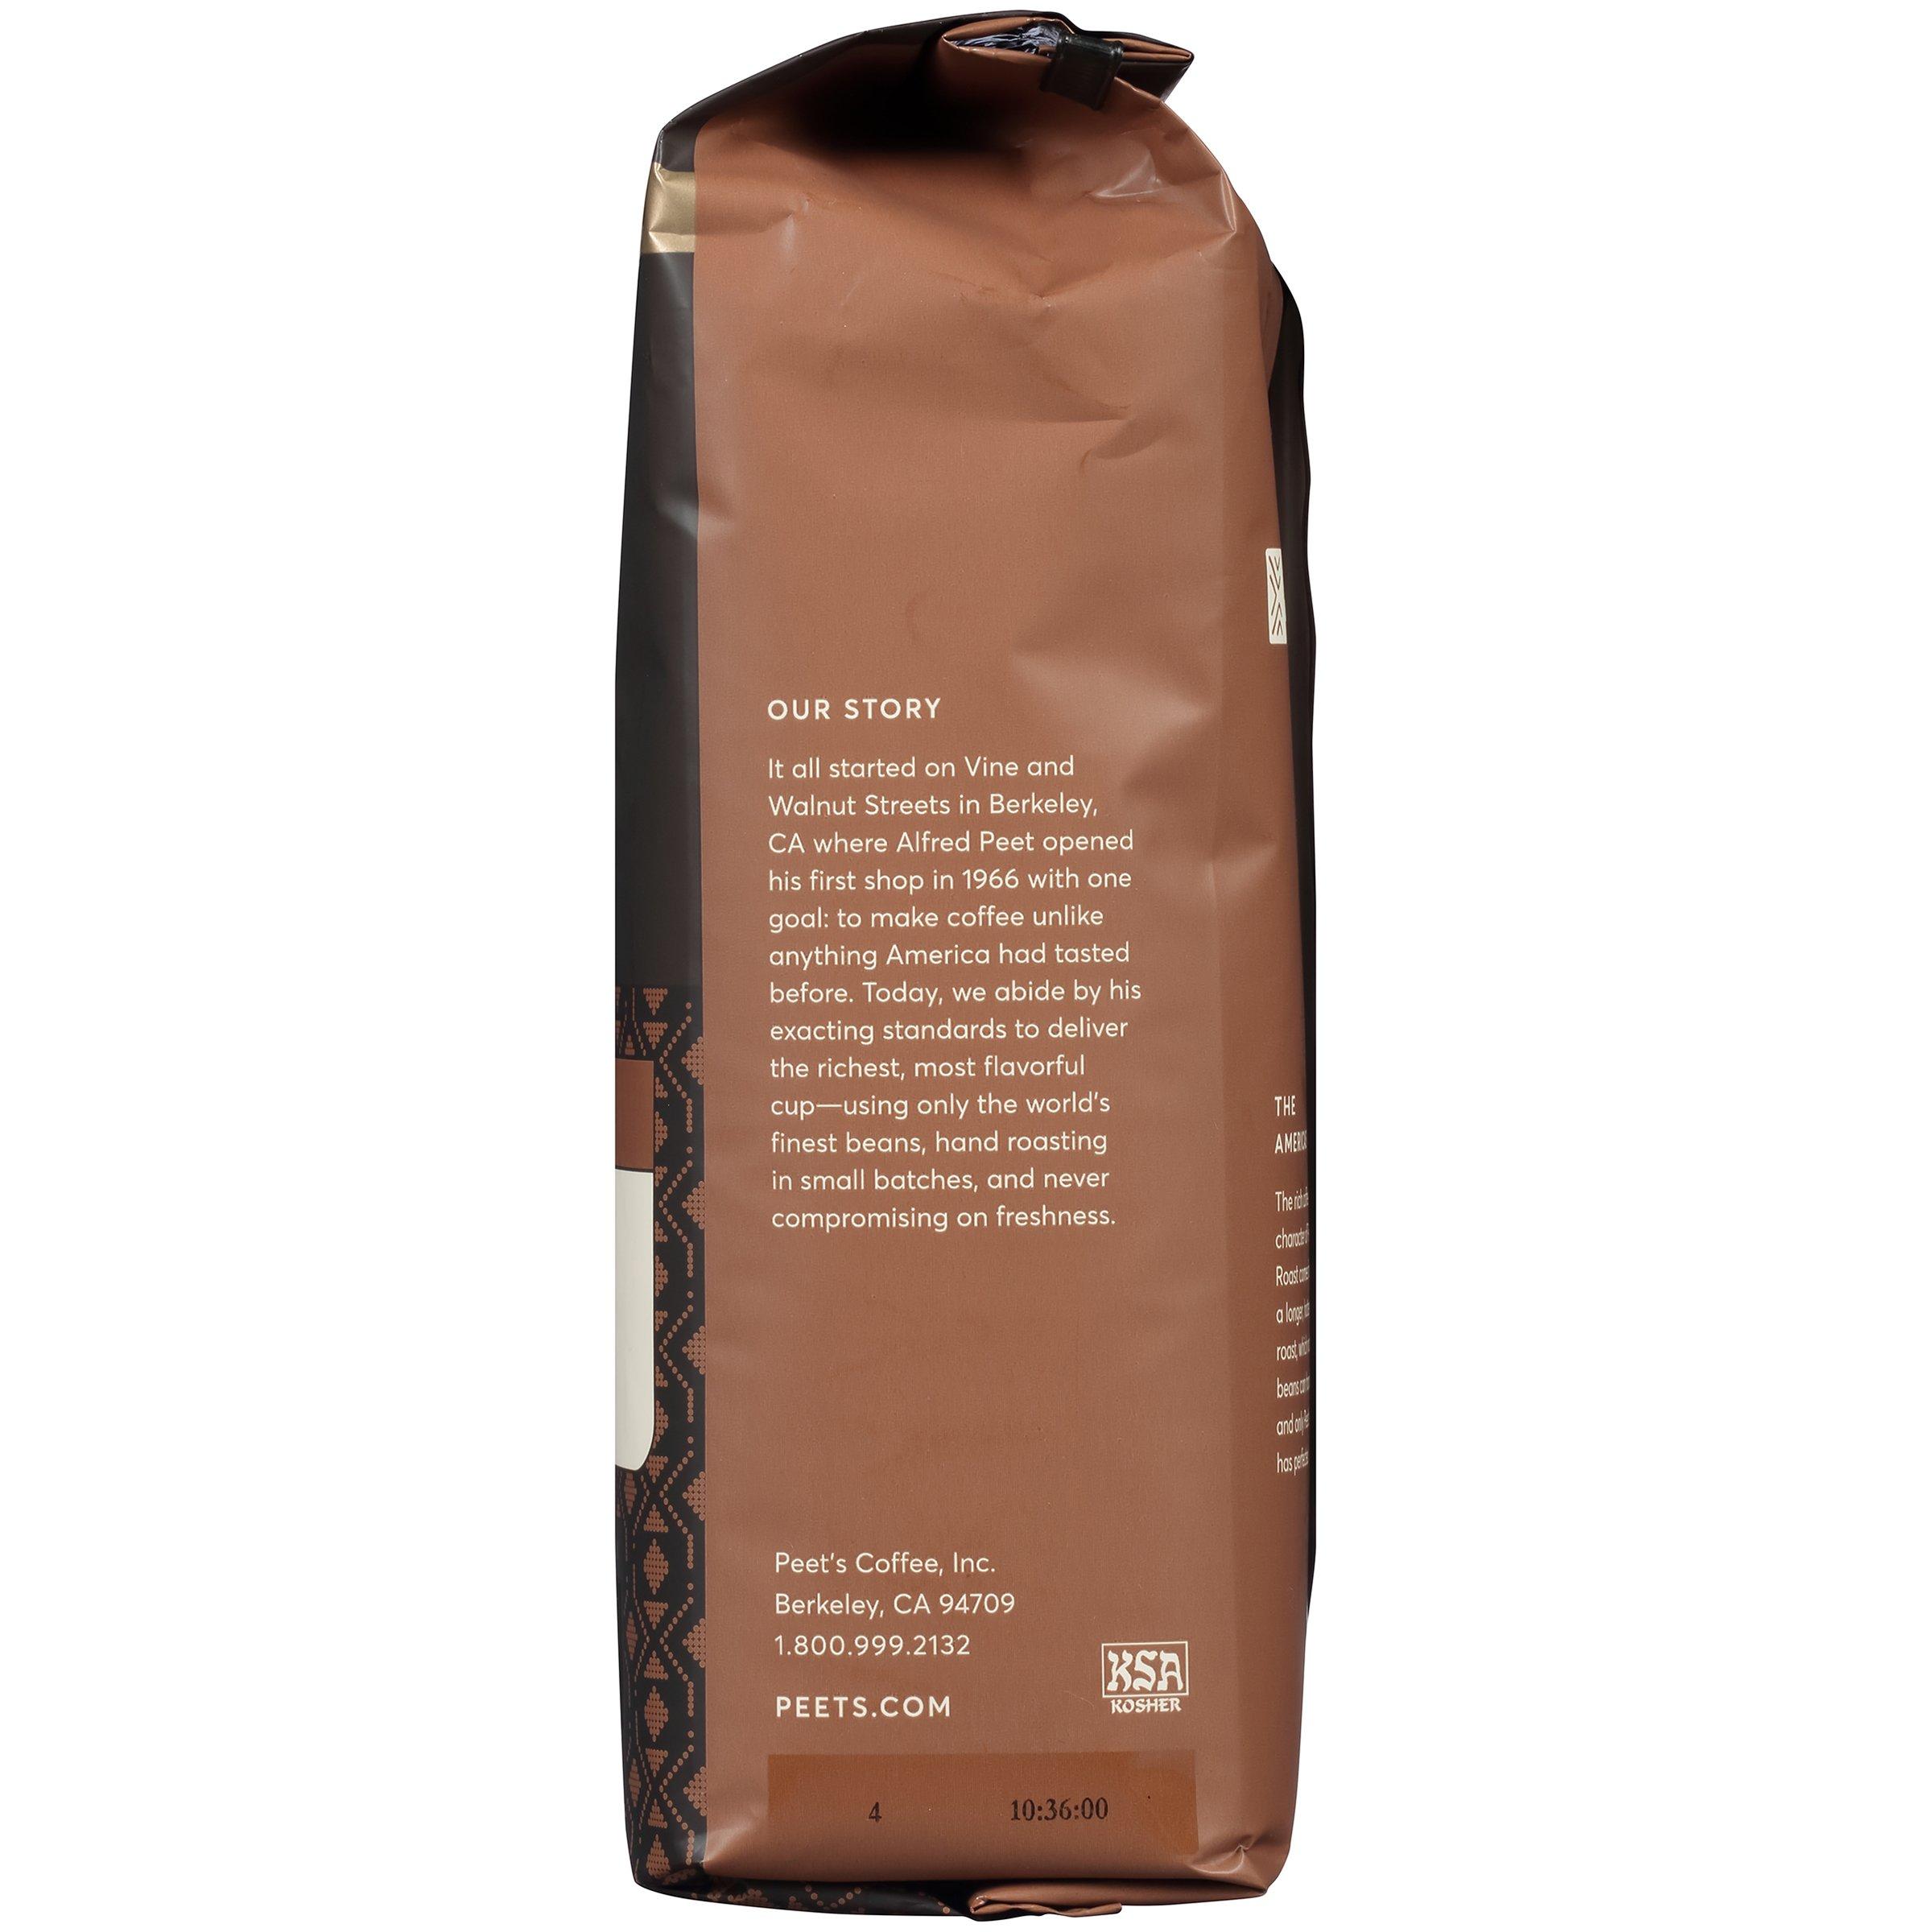 Peet's Coffee, Peetnik Pack, Major Dickason's Blend, Dark Roast, Ground Coffee, 20 oz. Bag, Rich, Smooth, and Complex Dark Roast Coffee Blend With A Full Bodied and Layered Flavor by Peet's Coffee (Image #4)